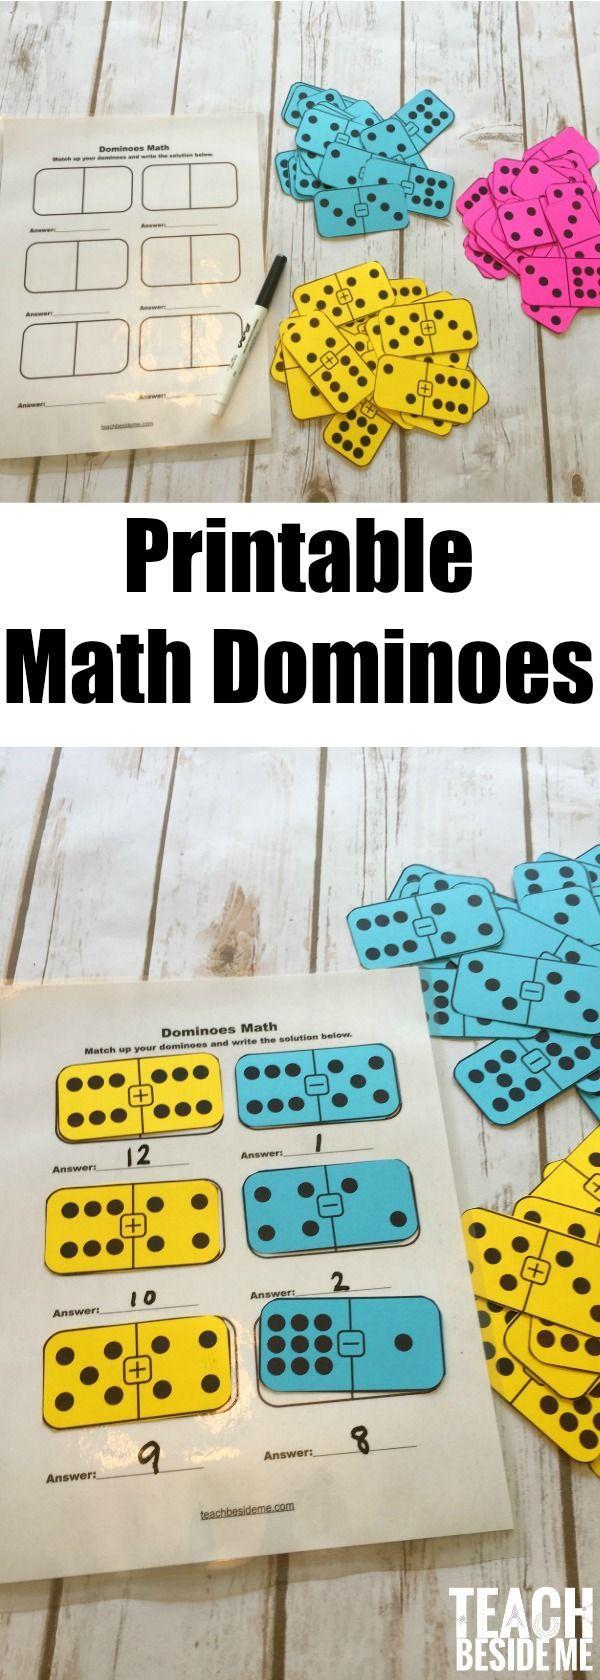 Printable Math Dominoes | Fun math games, Fun math and Multiplication